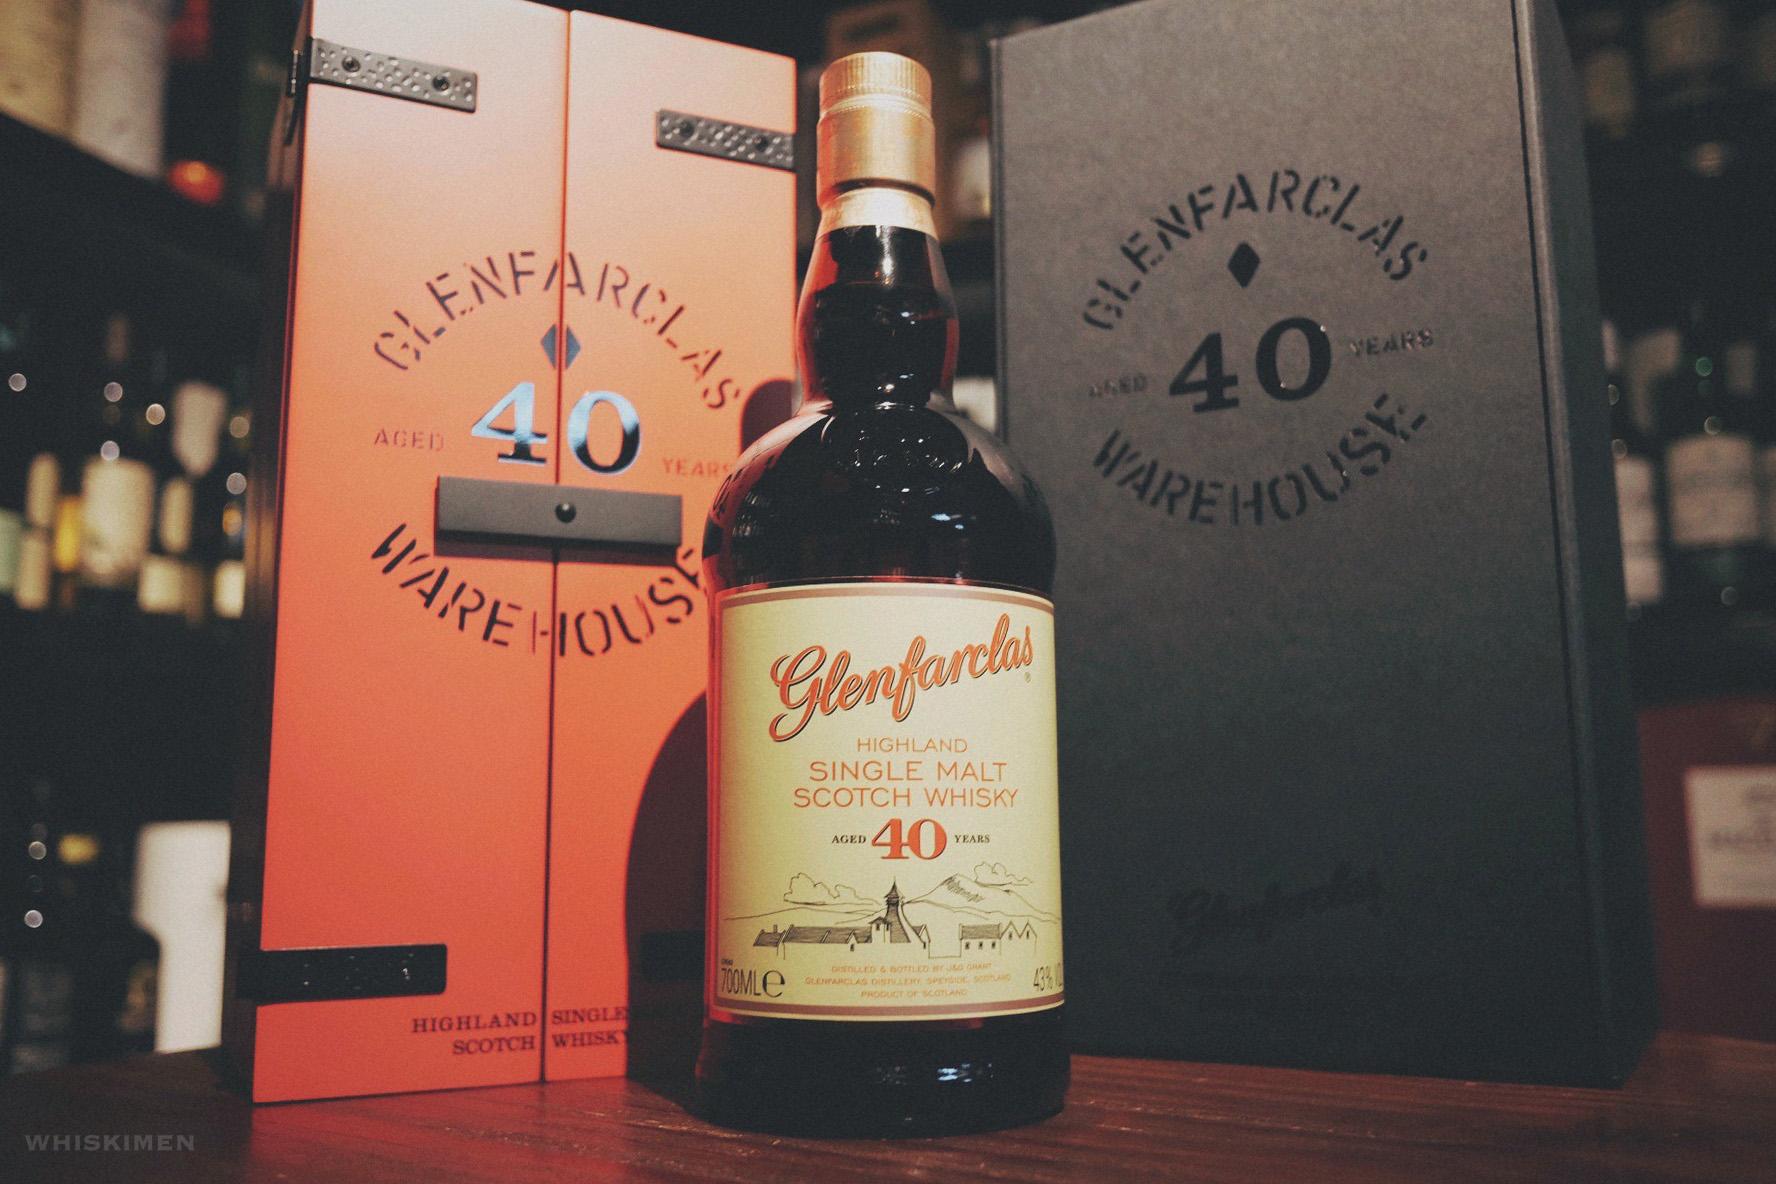 Glenfarclas 40 Year Old Single Malt Scotch Whisky (Warehouse Edition 2017)